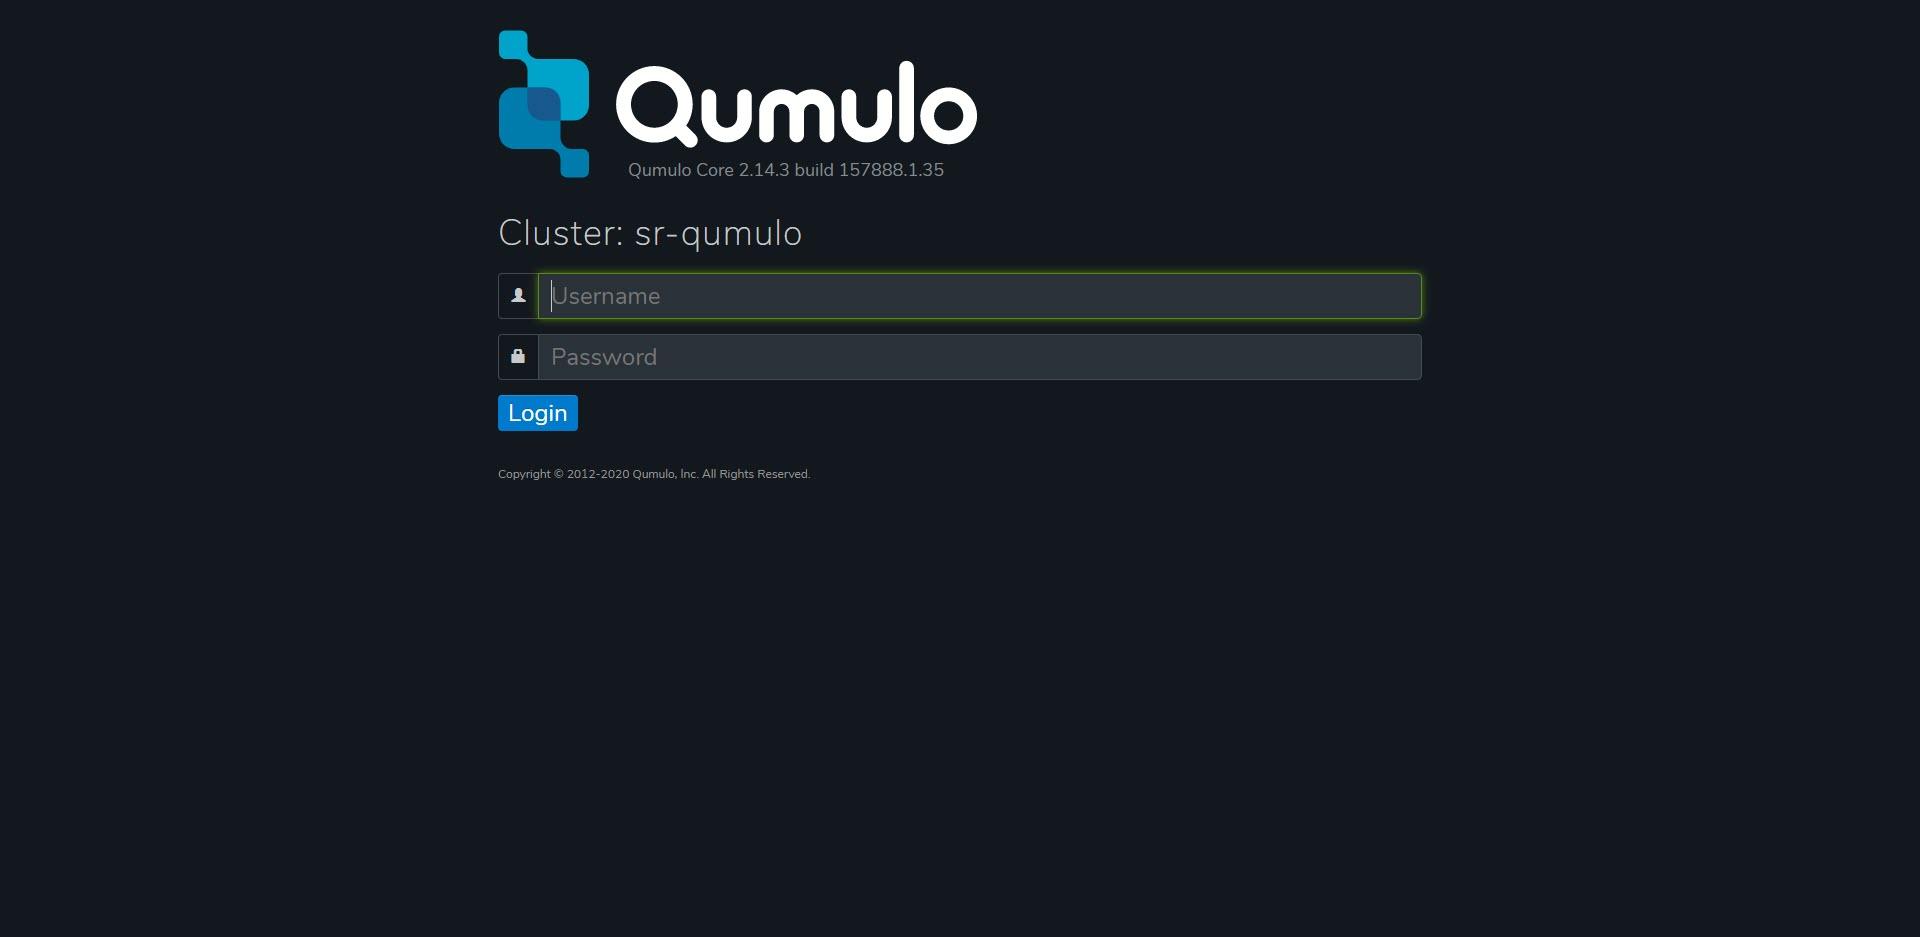 Qumulo Software login